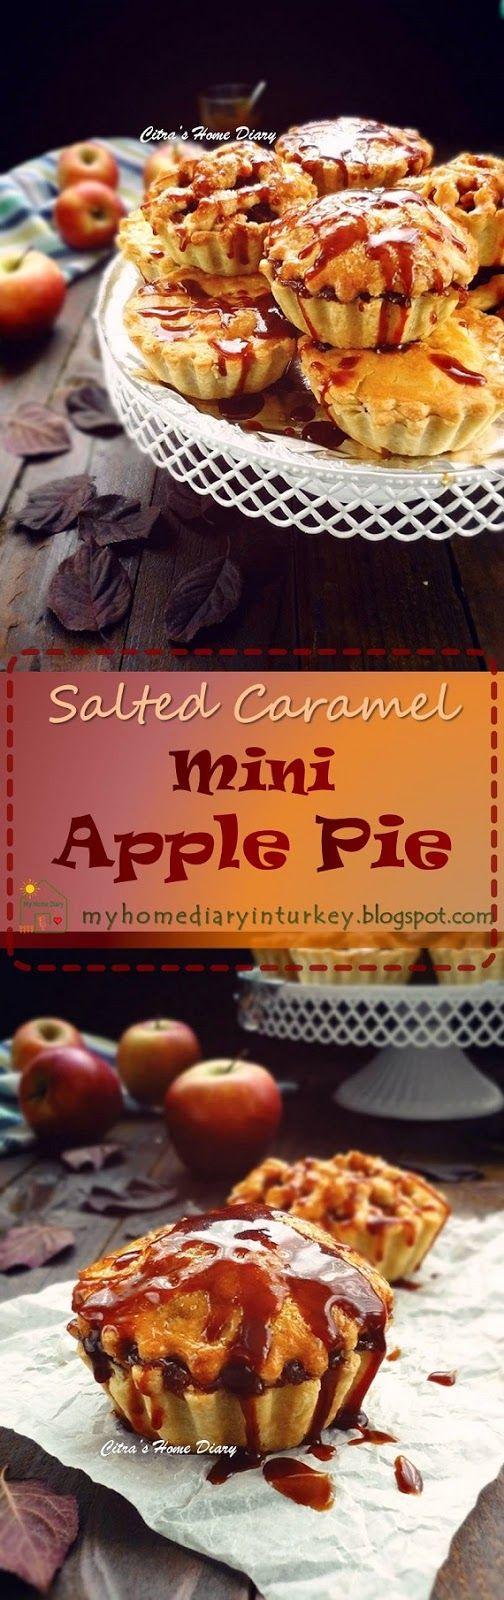 Apple pie with Salted Caramel Sauce. #applepie #saltedcaramel #pierecipes #fallbaking #apelpie